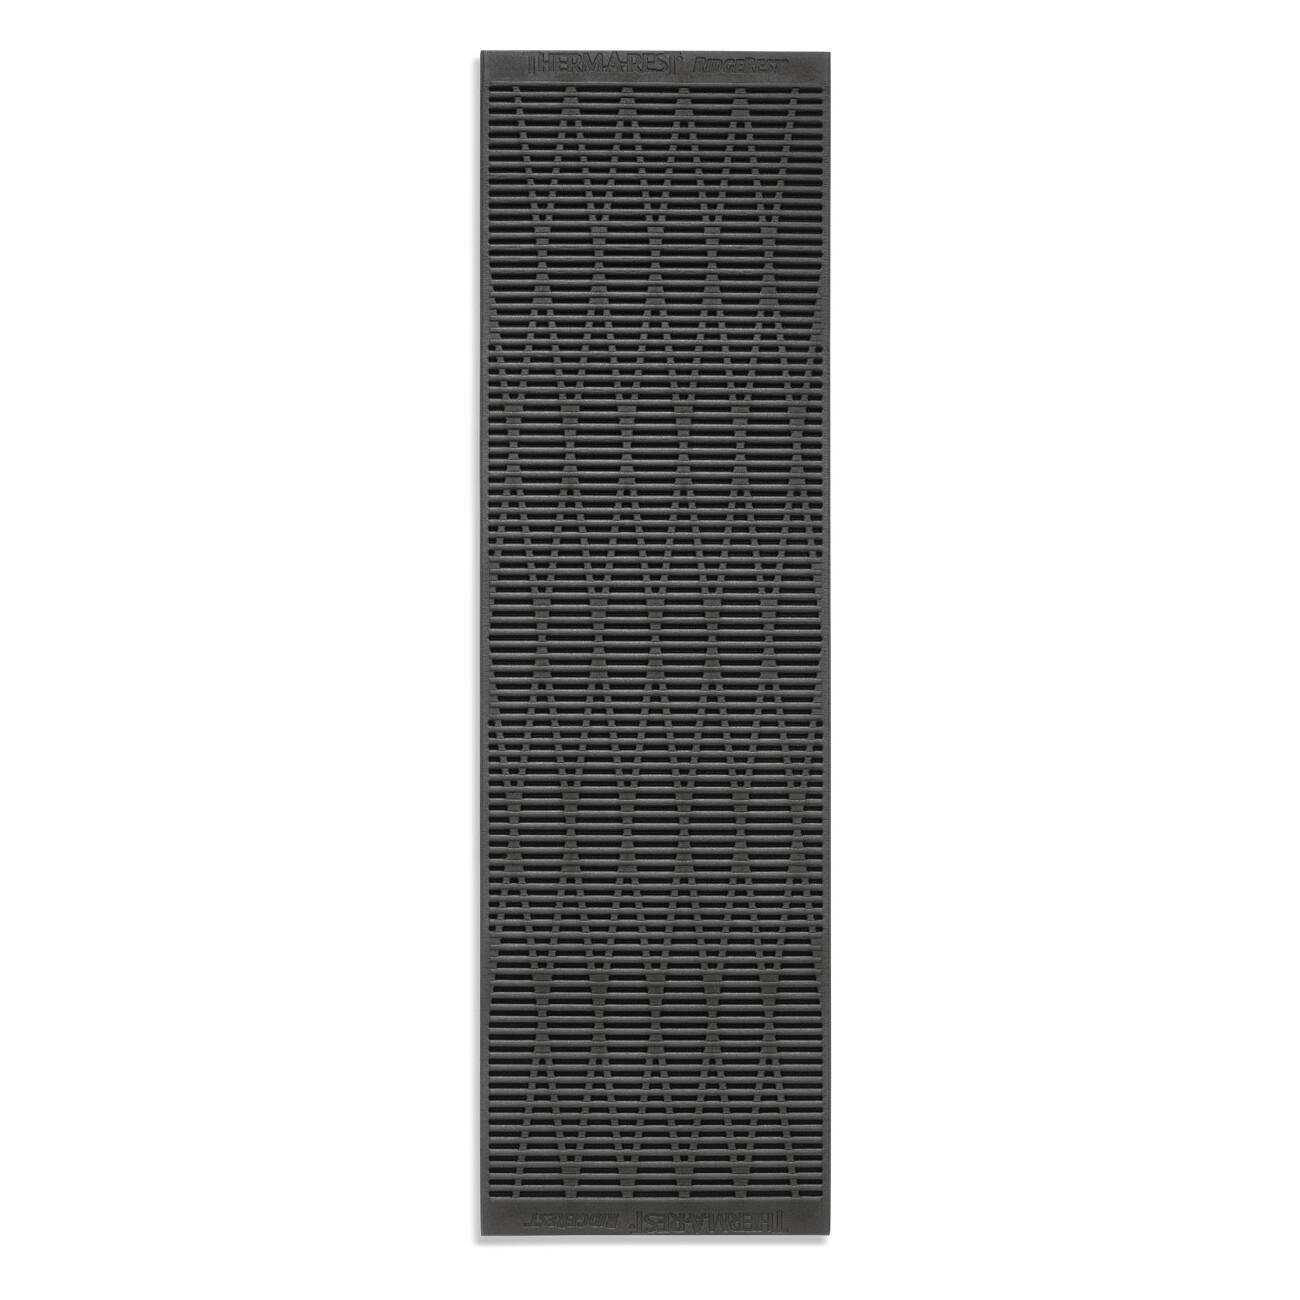 Therm-a-Rest RidgeRest Classic Mat L, charcoal (2019) | Misc. Transportation and Storage